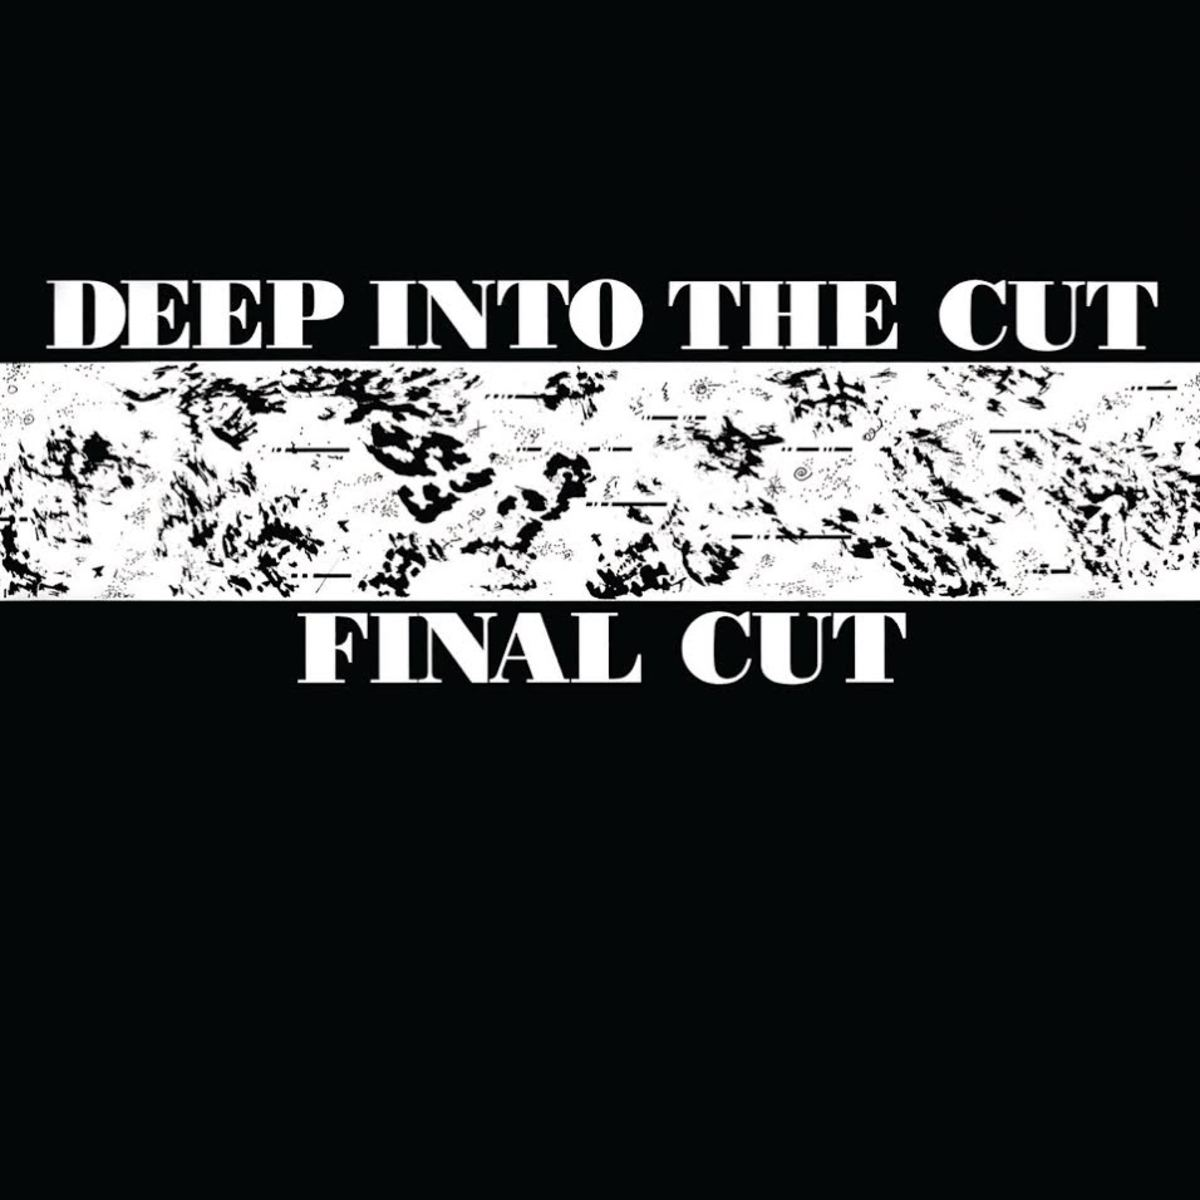 final cut deep into the cut